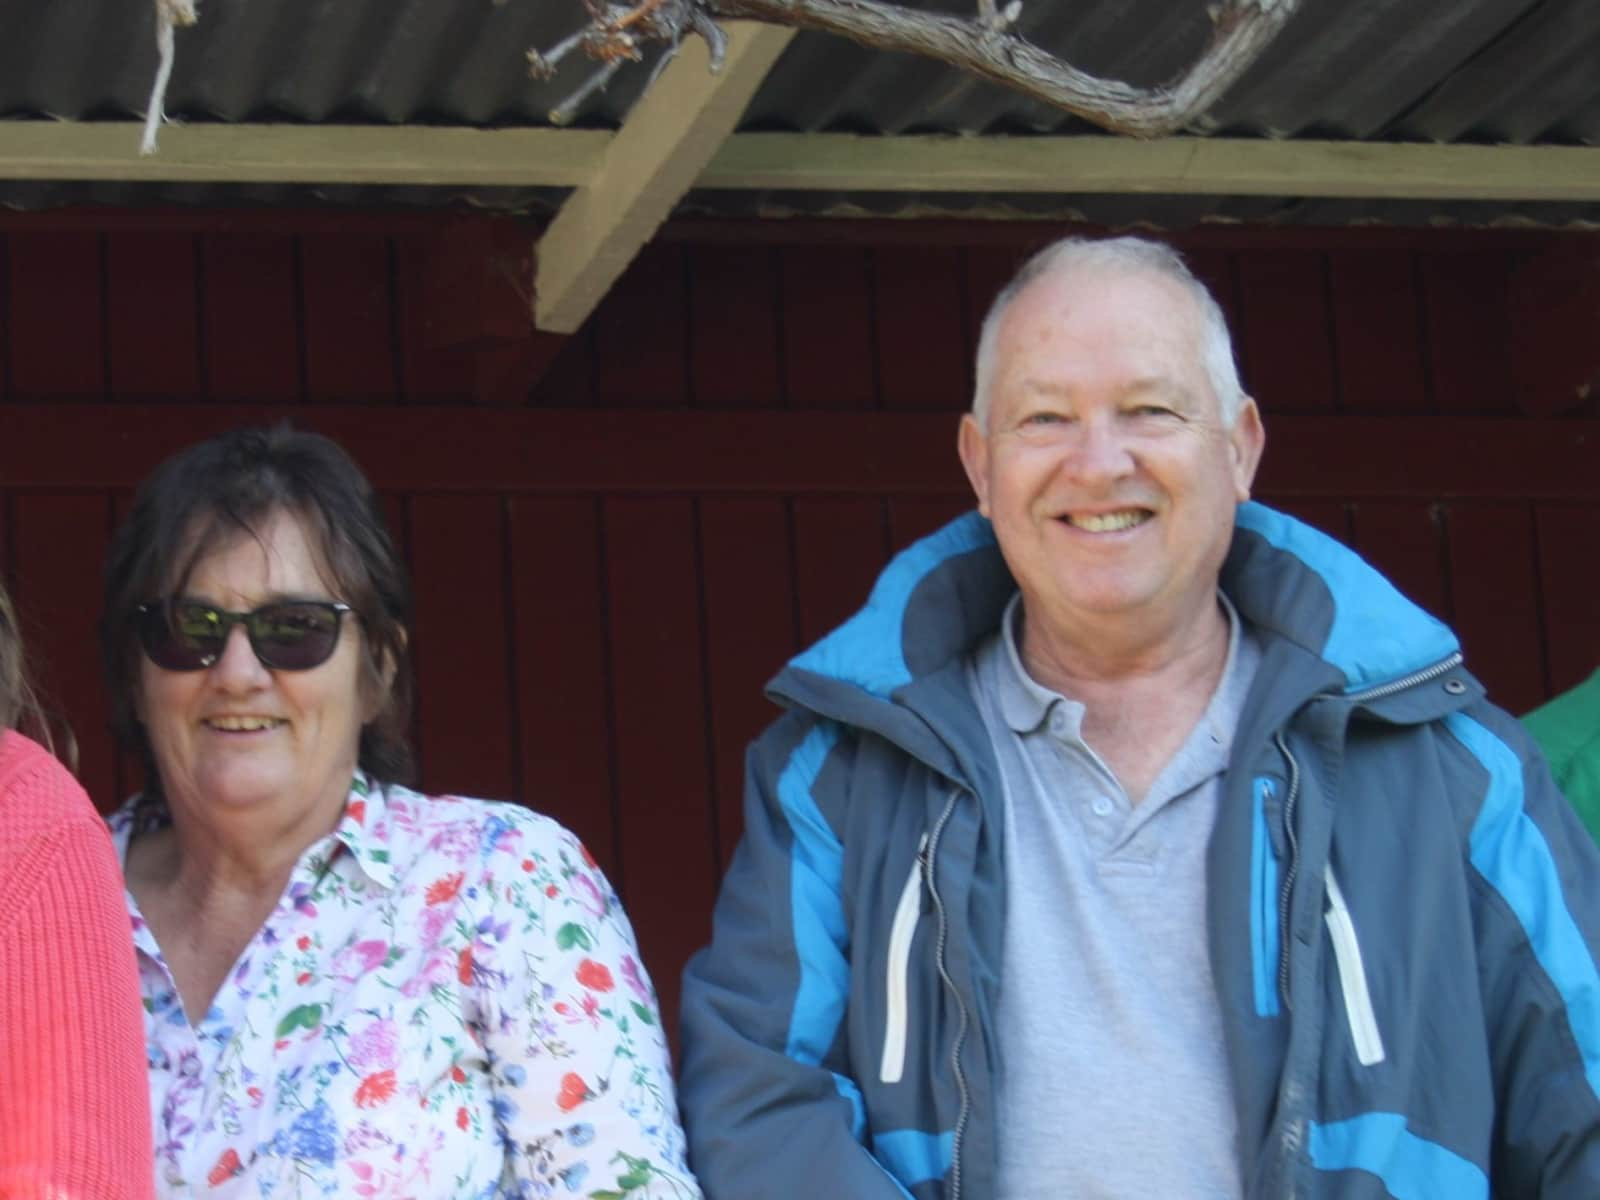 Jann & Greg from Sydney, New South Wales, Australia